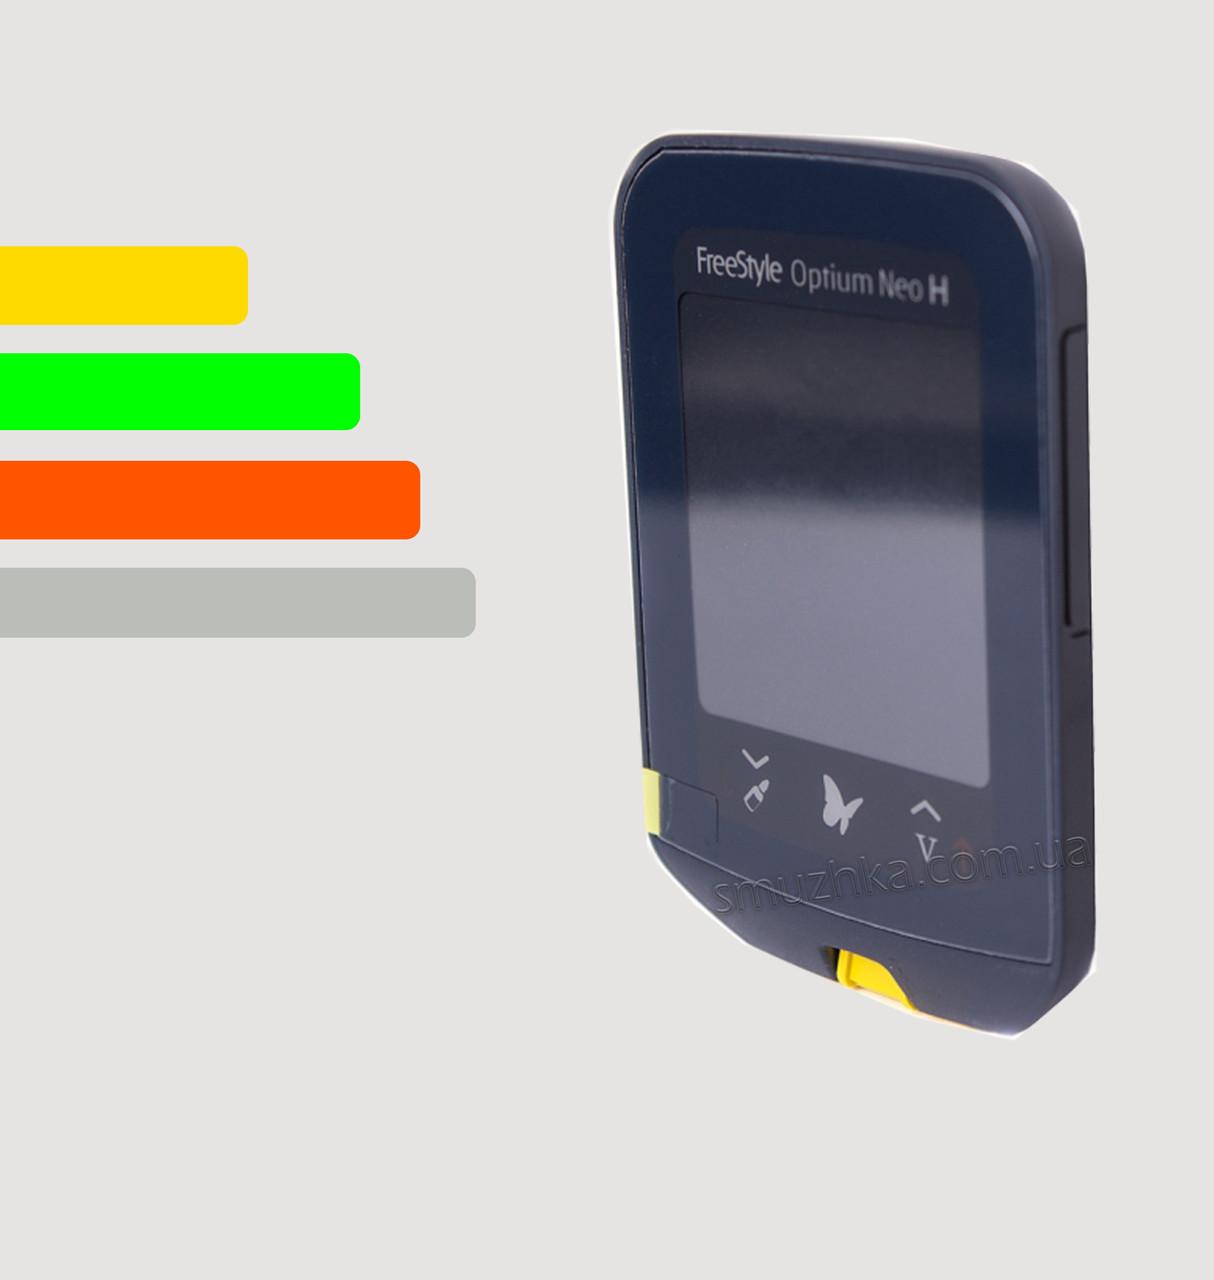 Глюкометр Freestyle Optium Neo H - Фристайл Оптиум Нео H